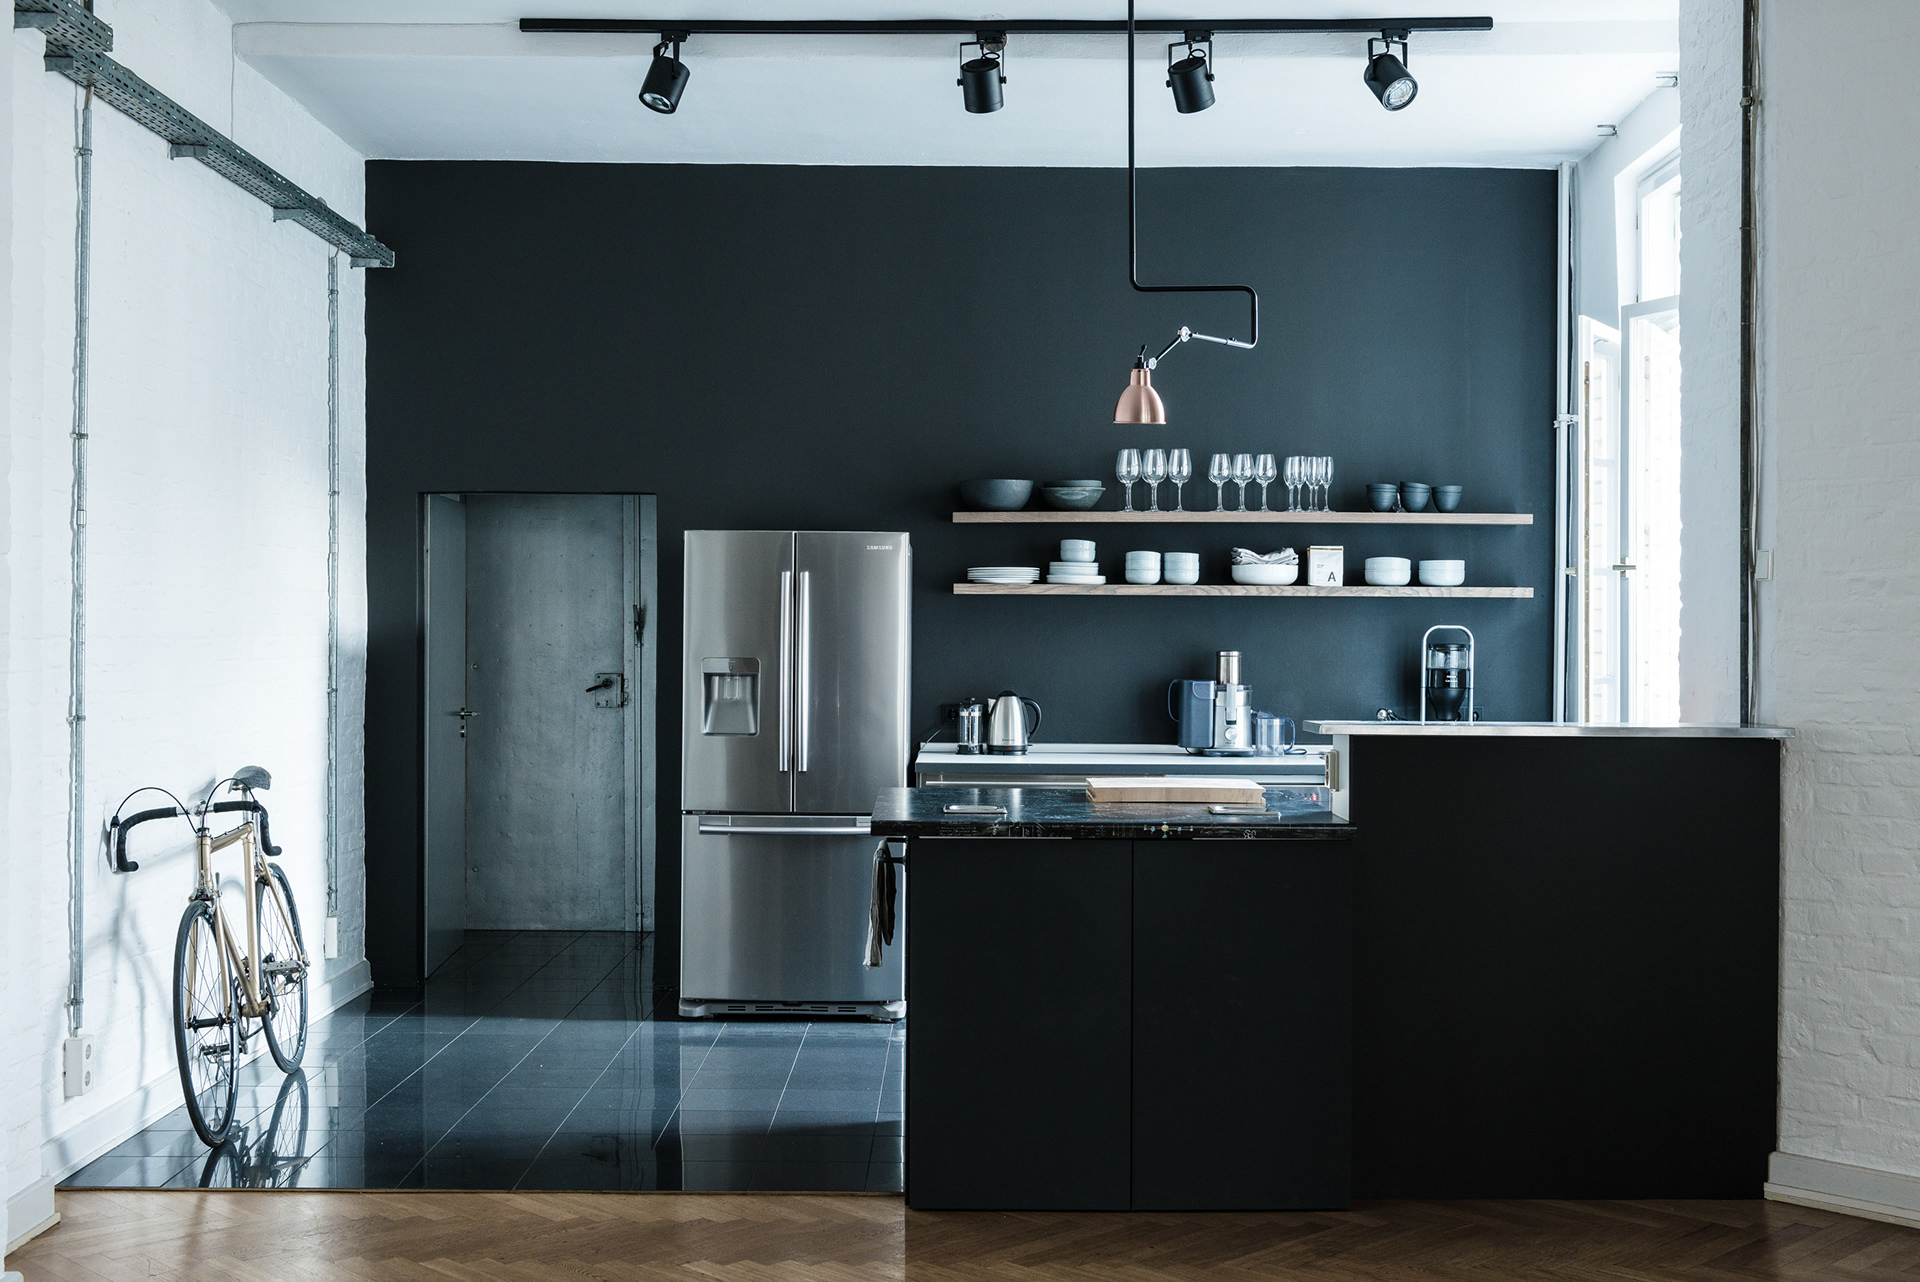 Annabell Kutucu - Loft Apartment & Studio Berlin